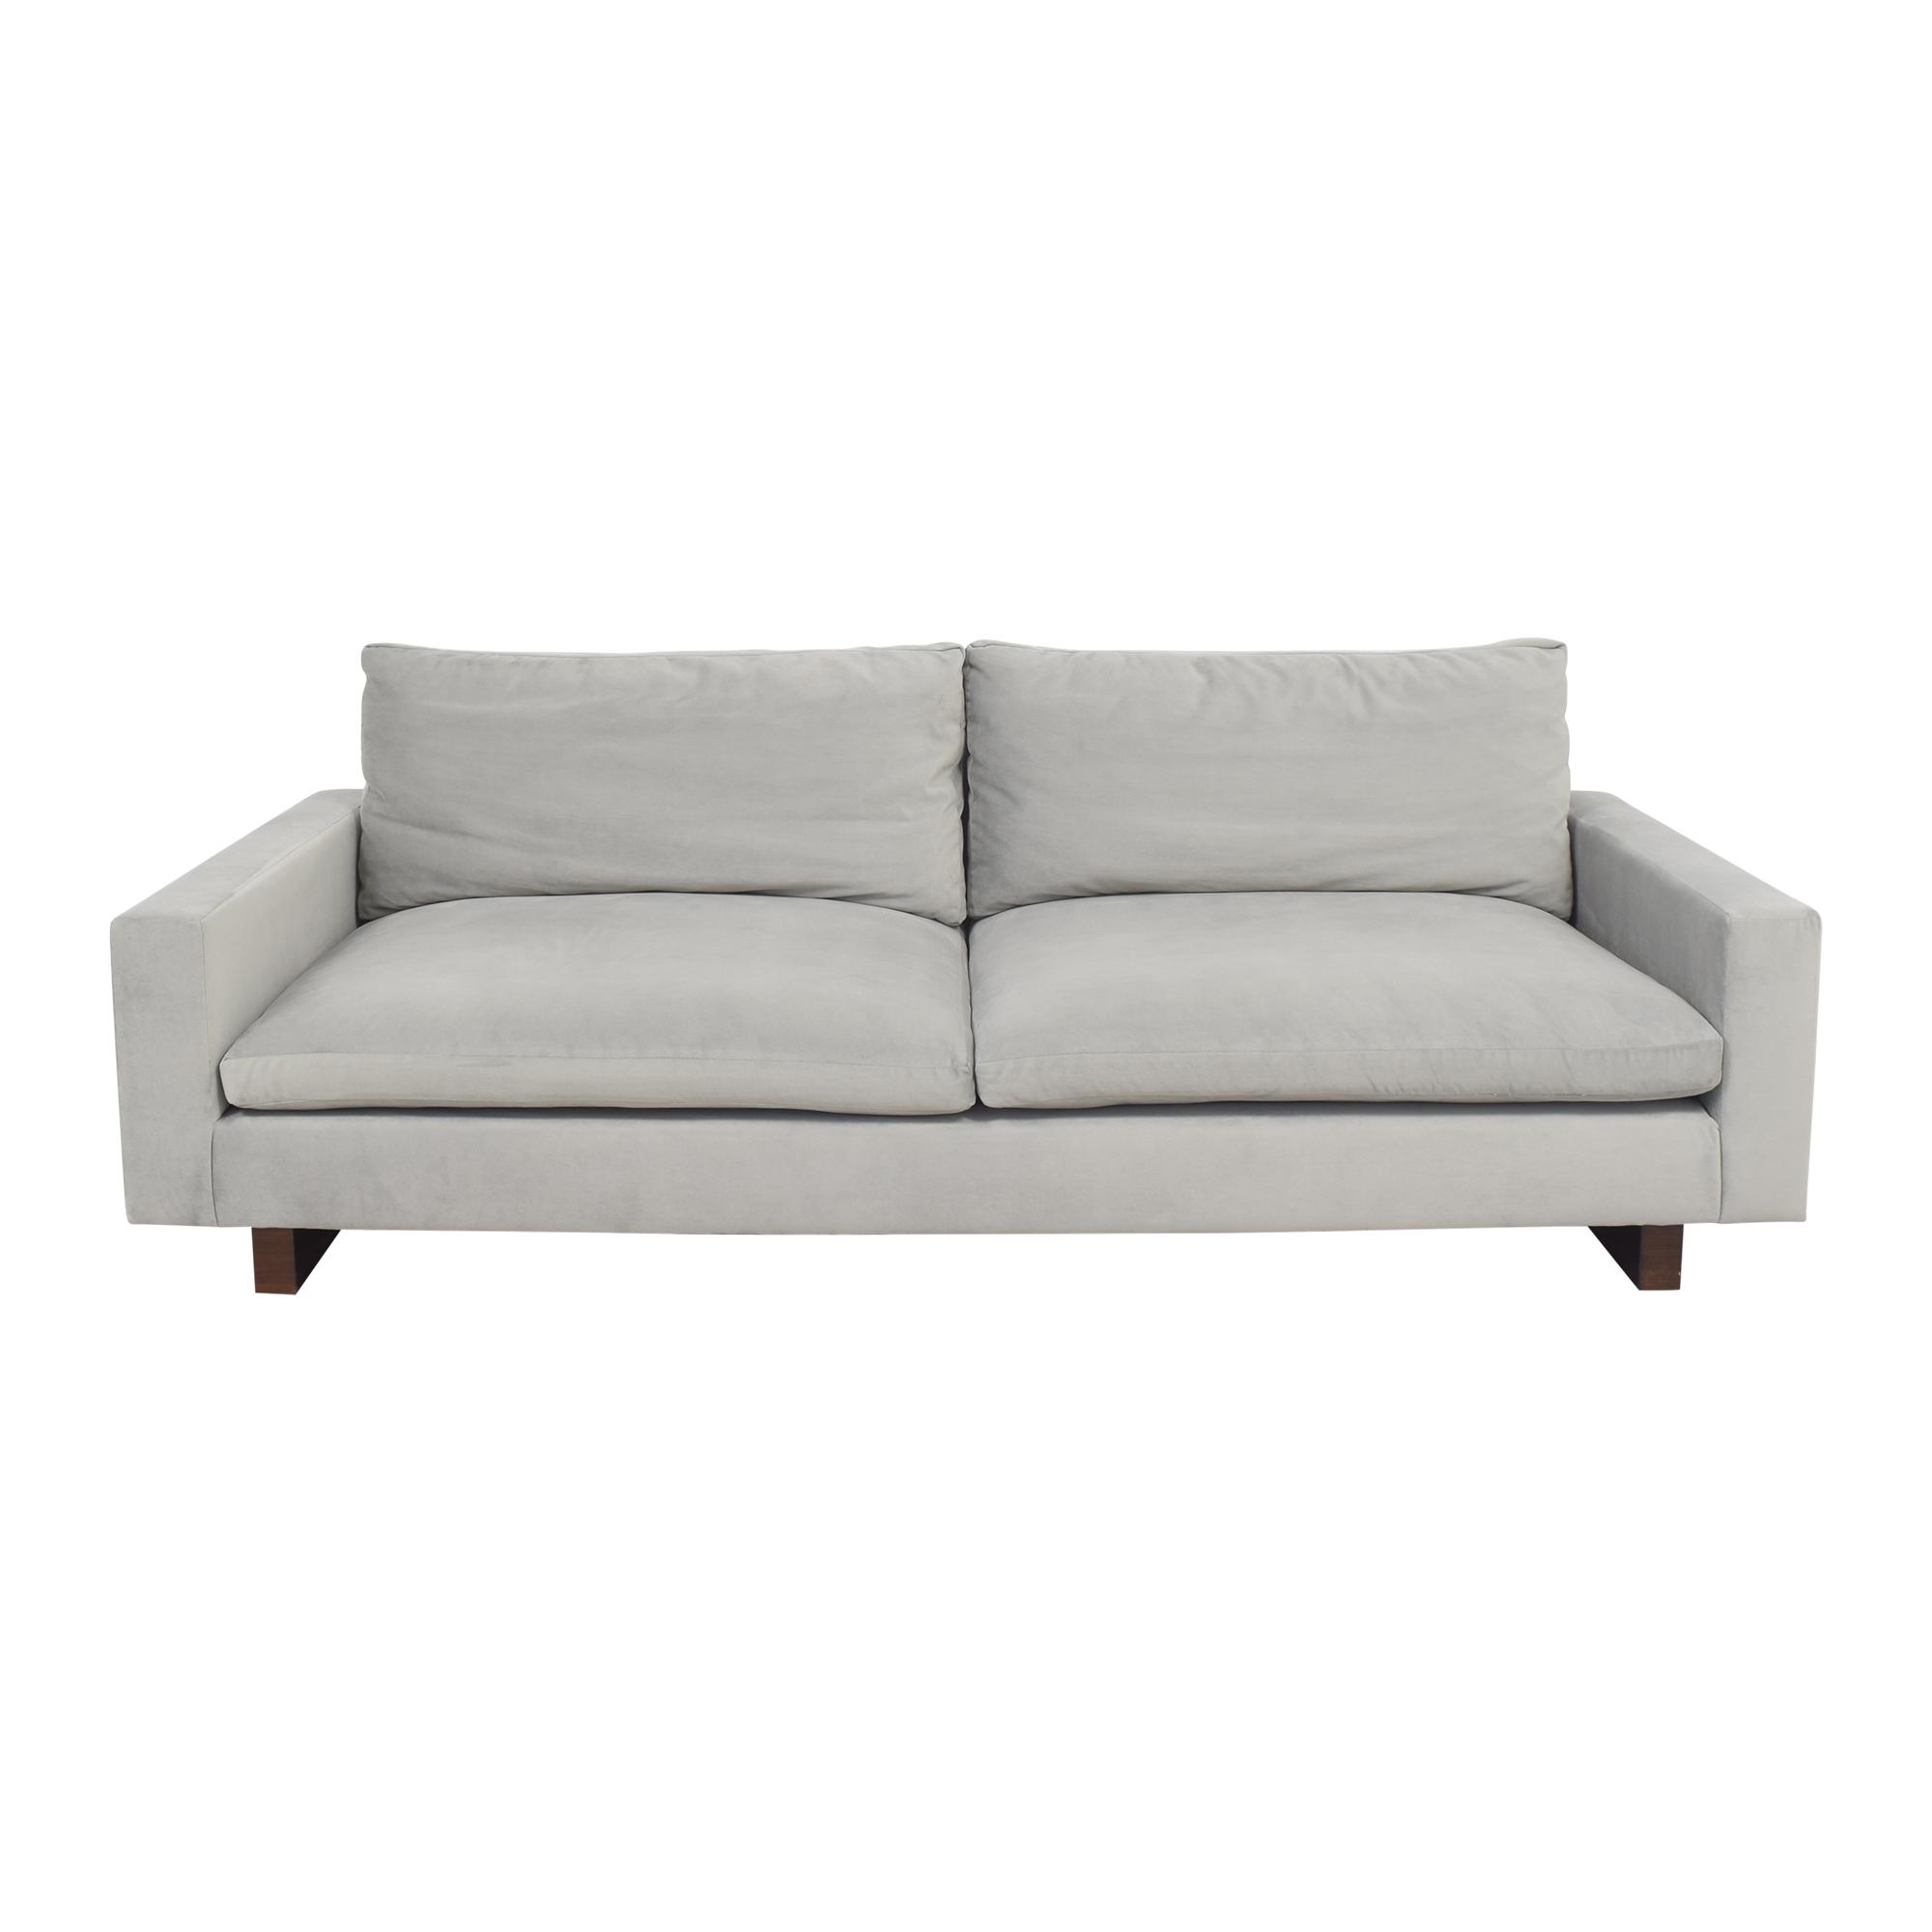 shop West Elm West Elm Harmony Two Cushion Sofa online